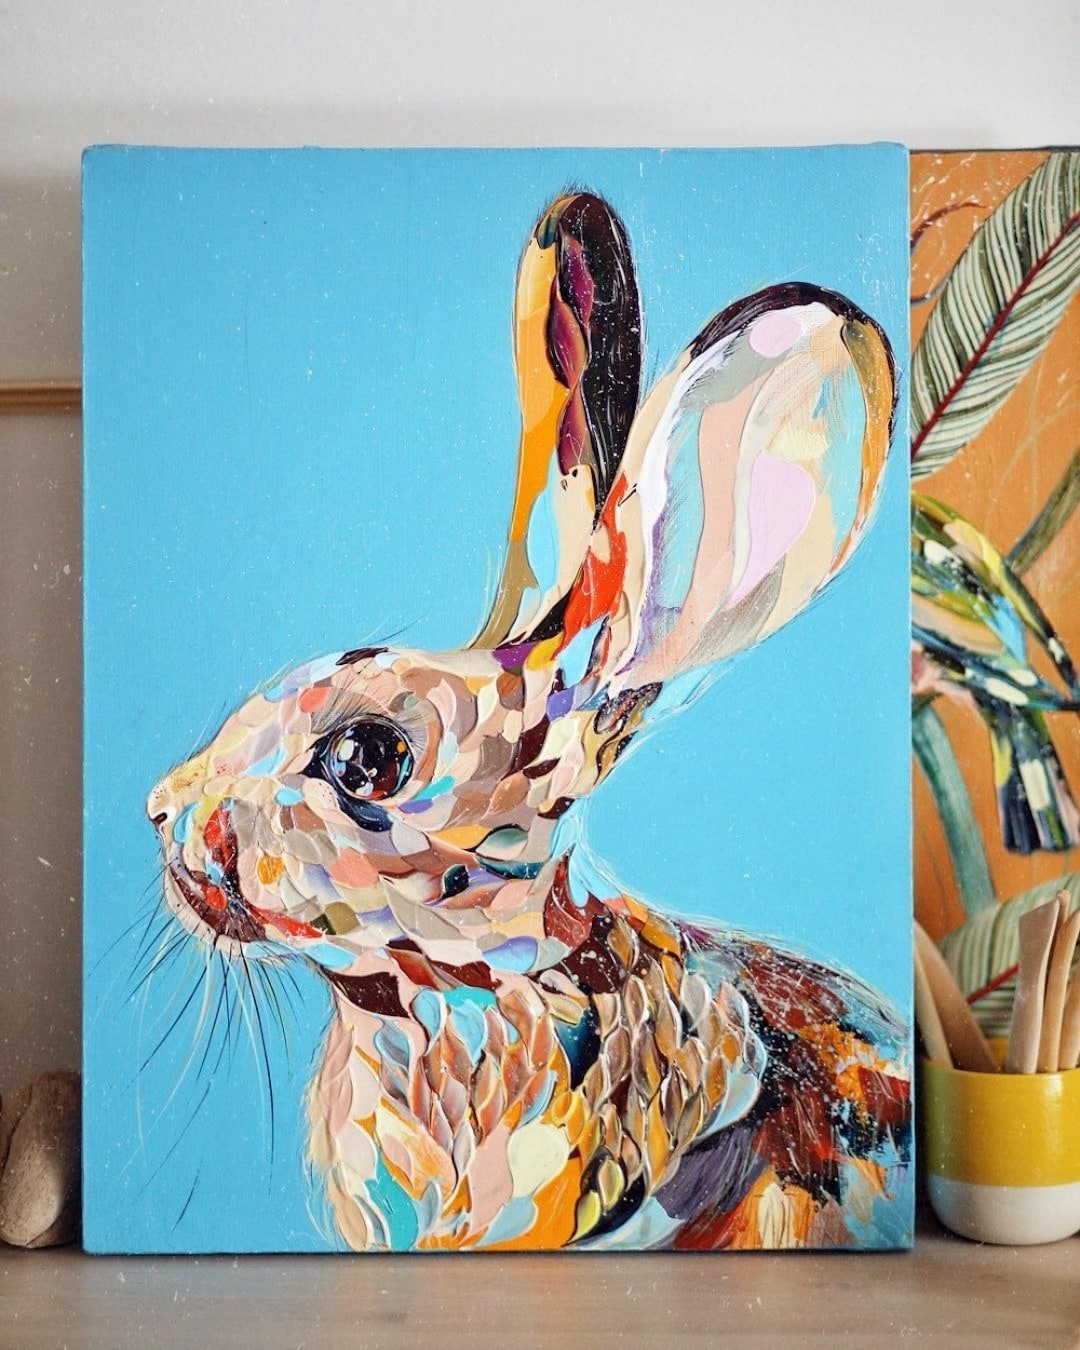 Animal Palette Knife Paintings by Anastasia Ablogina